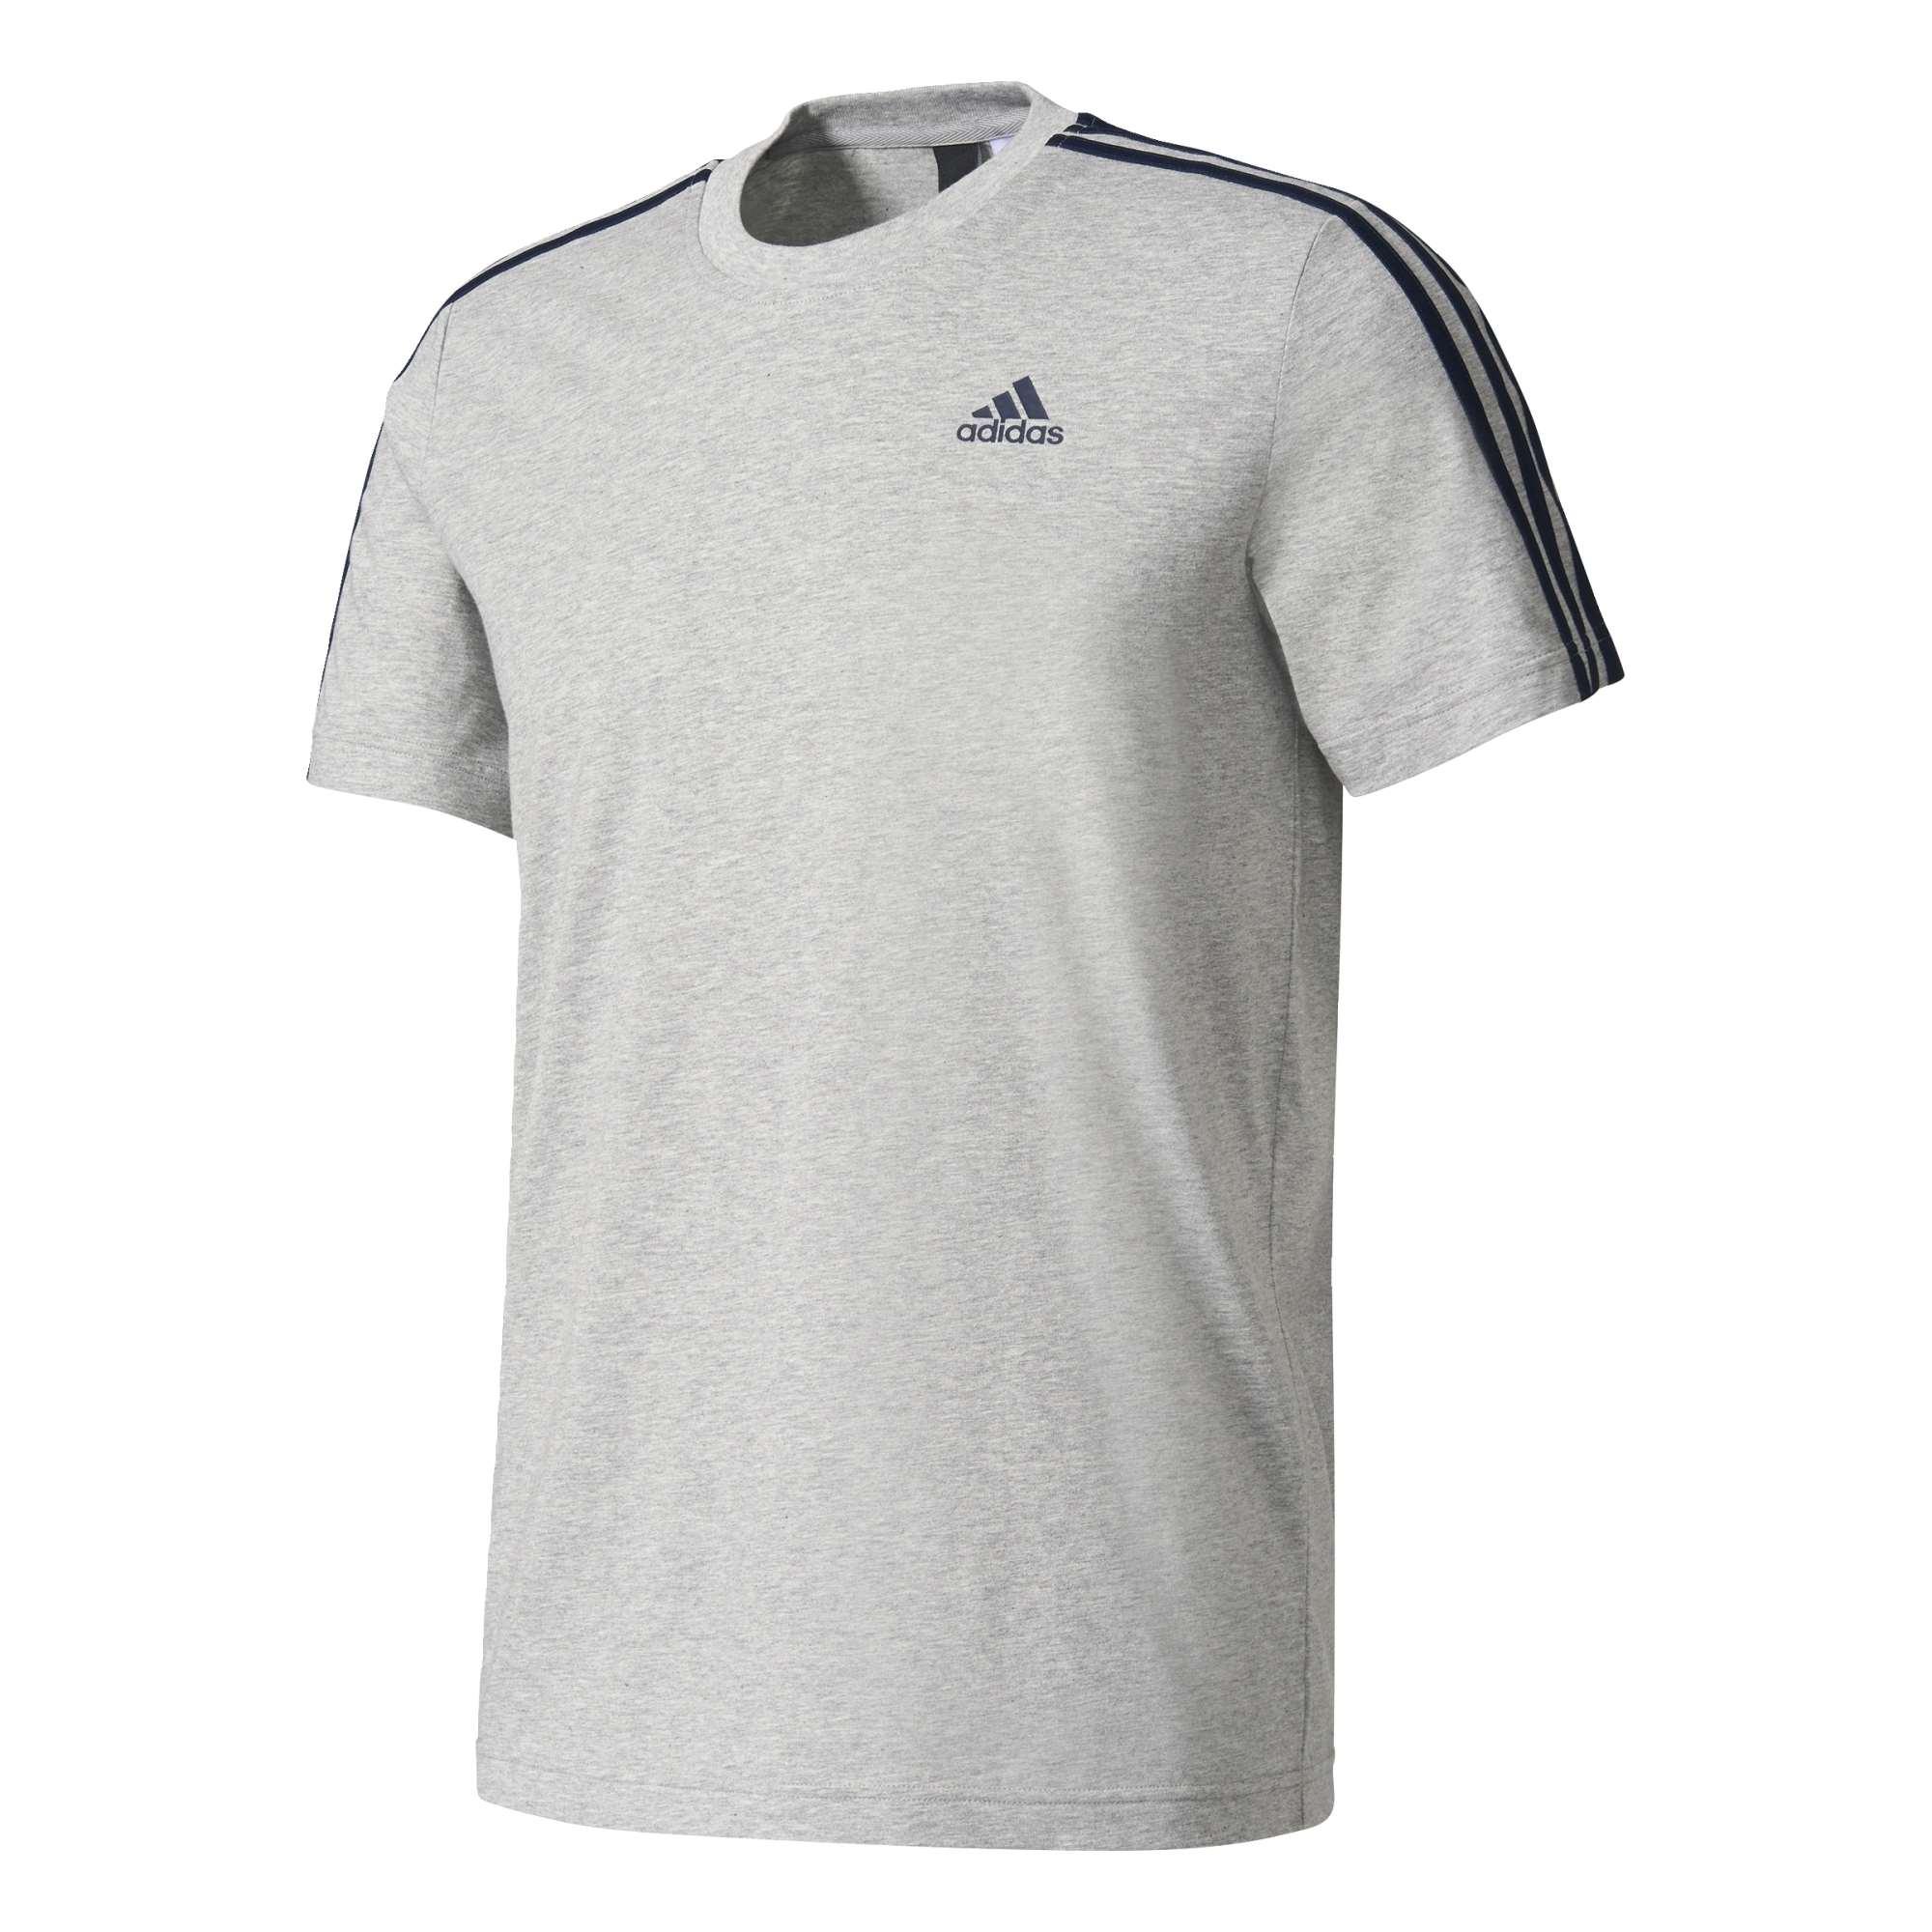 Adidas Ess 3s Tee Heren sportshirt